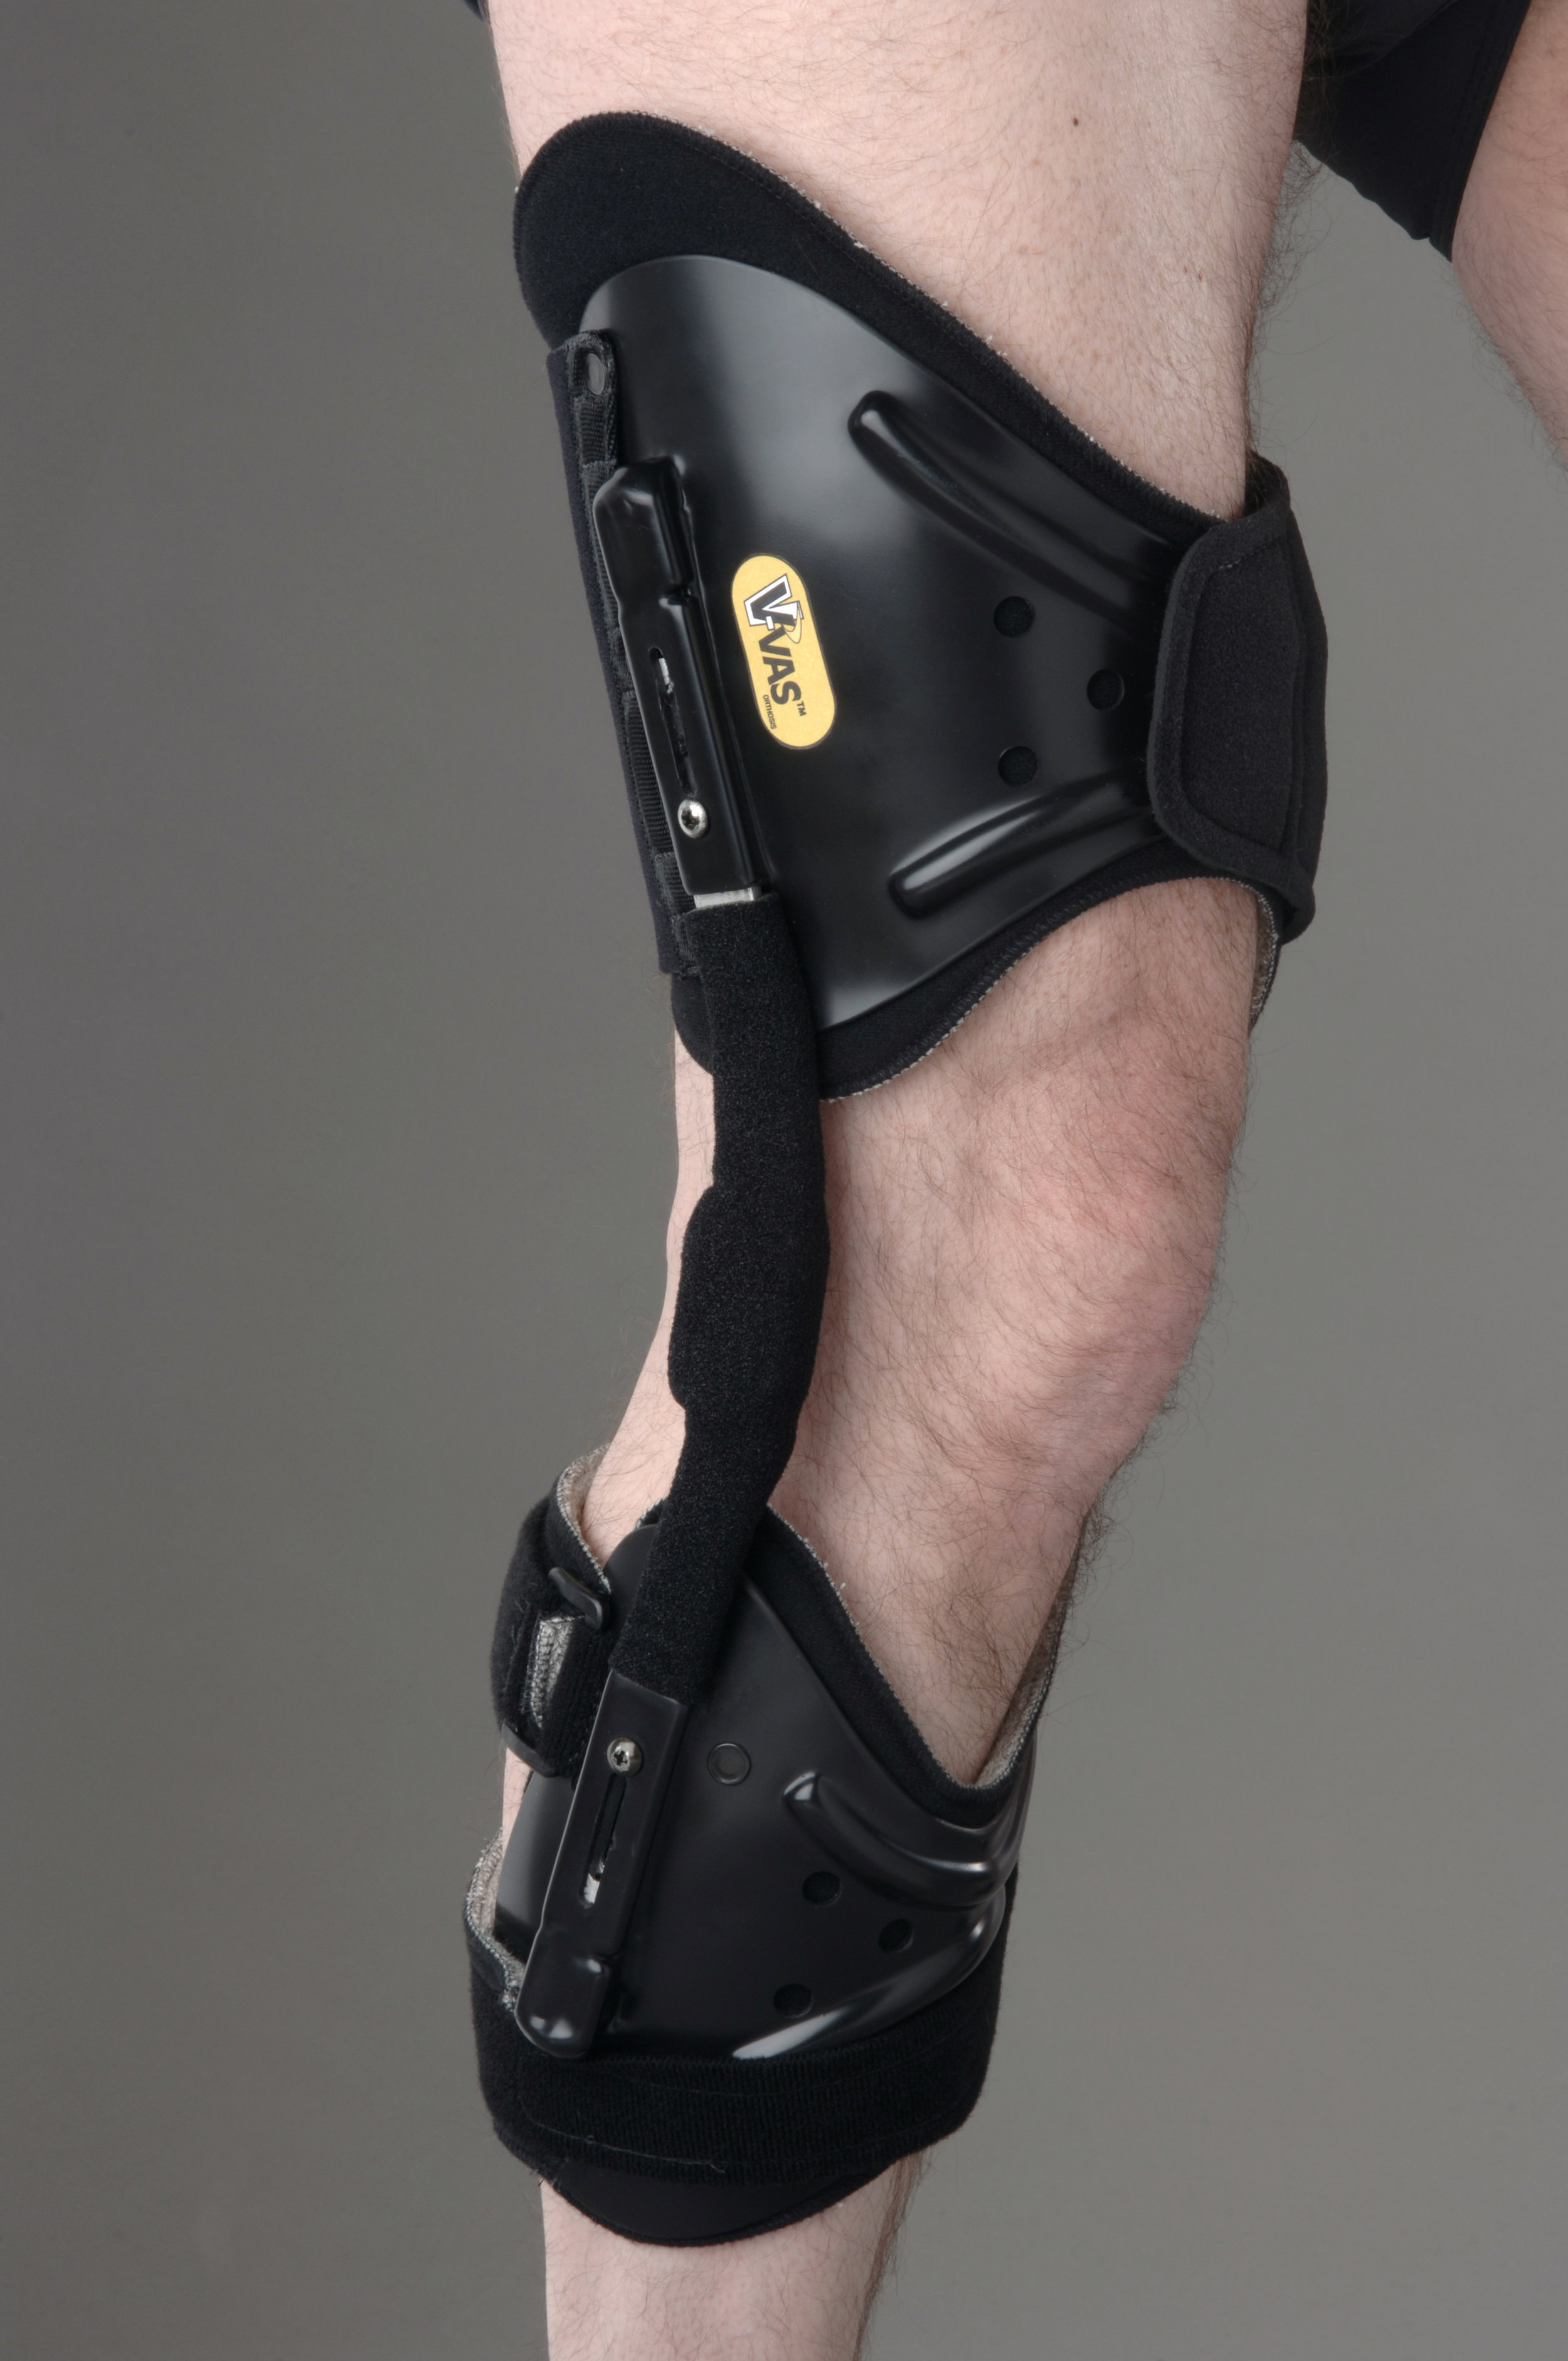 The V-VAS knee orthosis for single compartment osteoarthritis